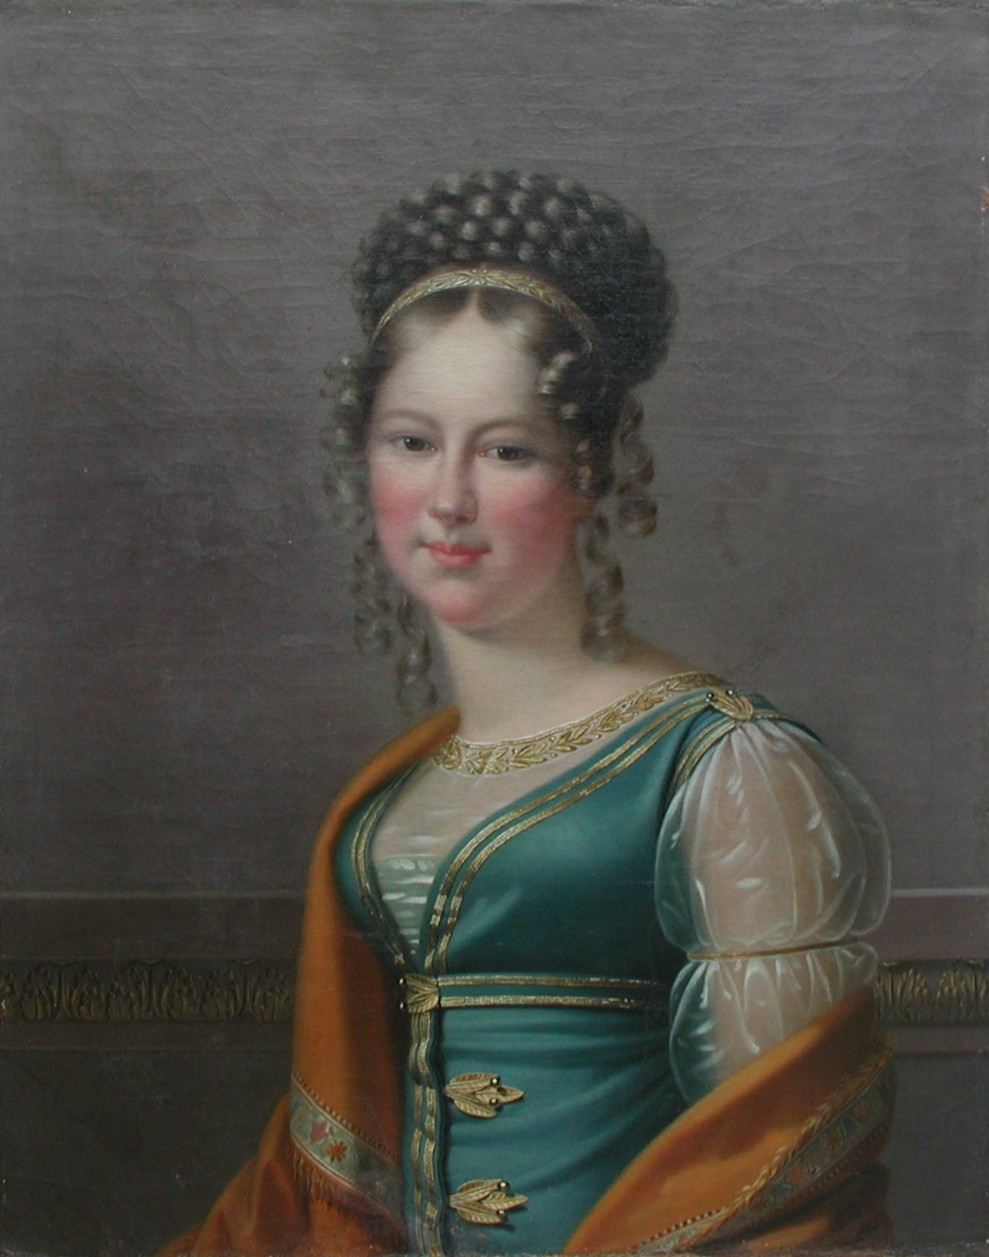 Mária Antónia Koháry